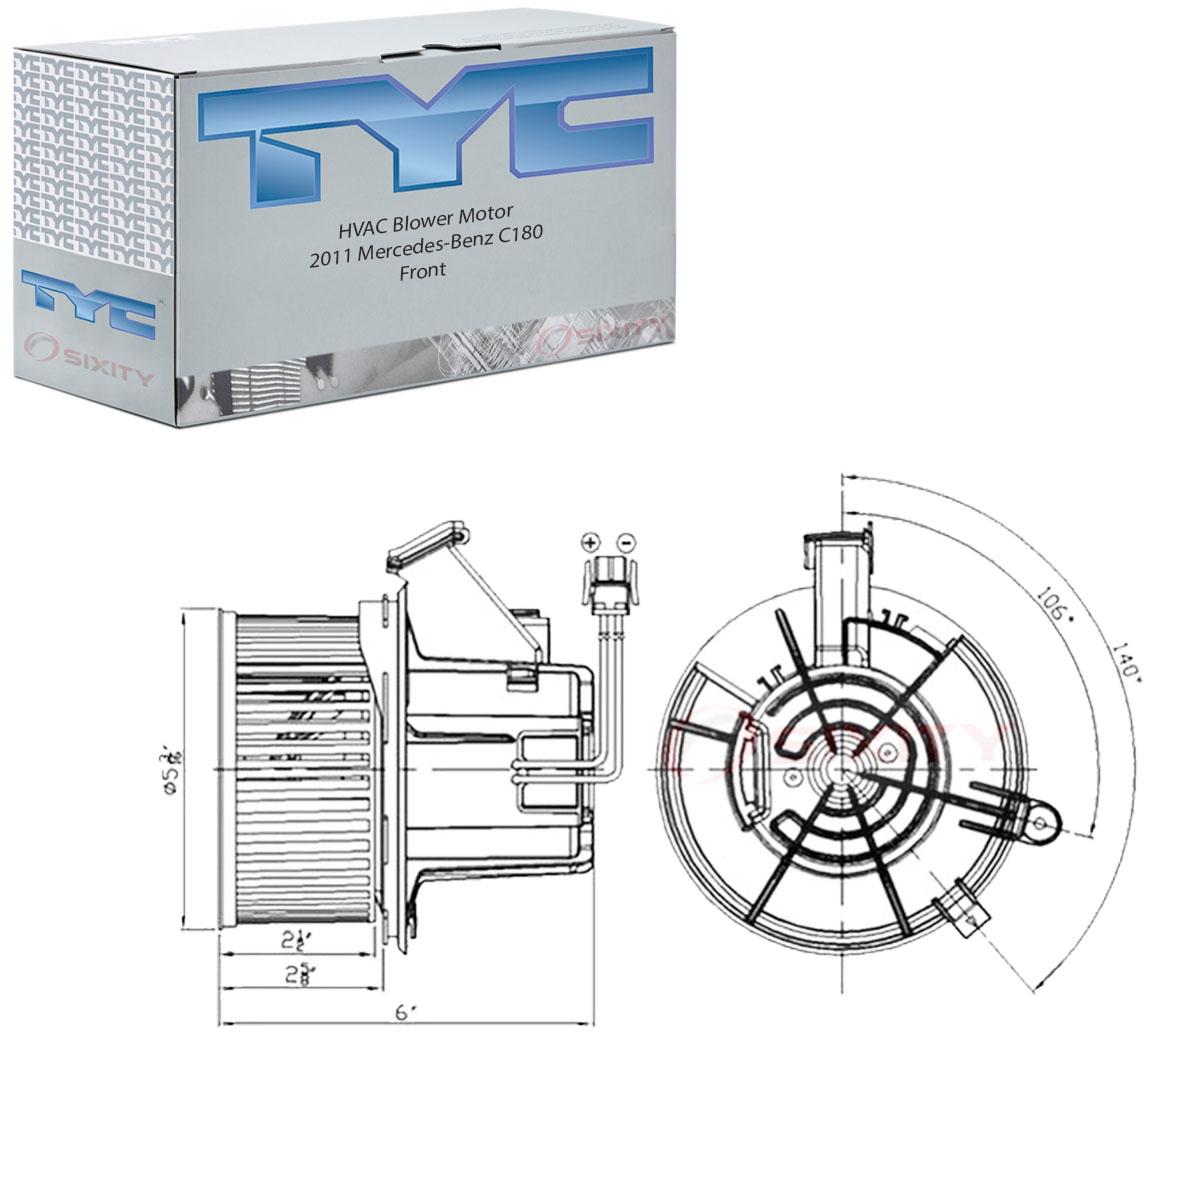 hight resolution of 1200x1200 tyc frontal hvac motor del ventilador para mercedes benz